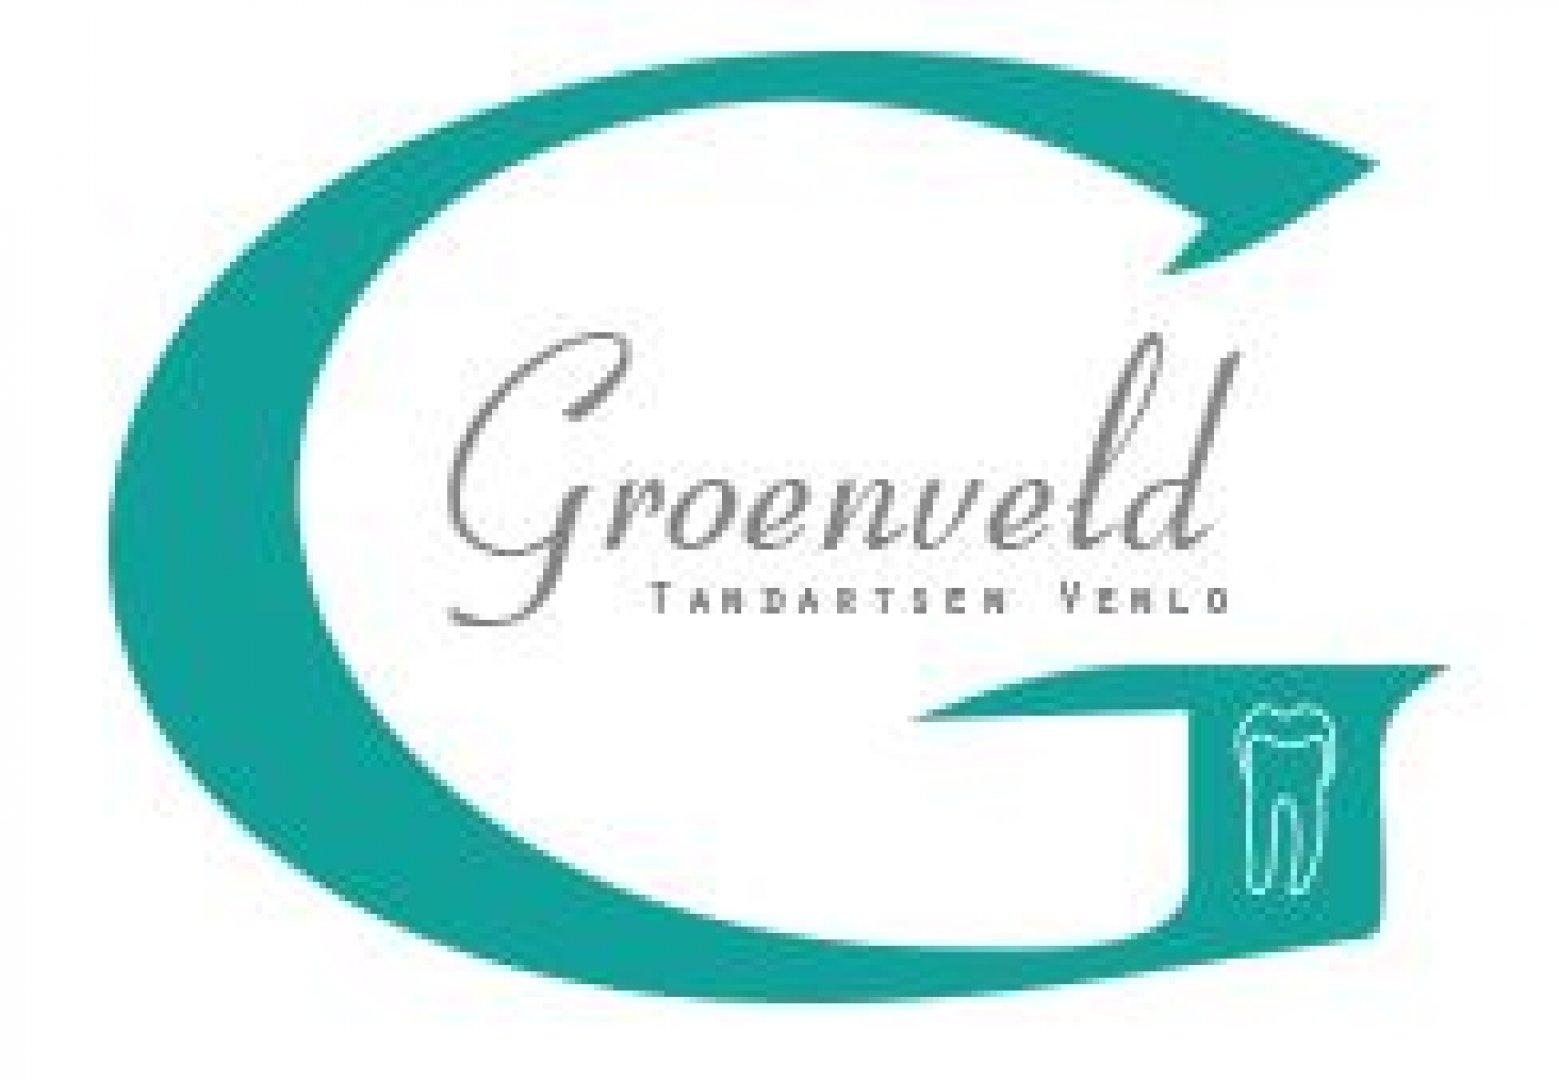 Tandartspraktijk Geraeds / Tandartsen Groenveld